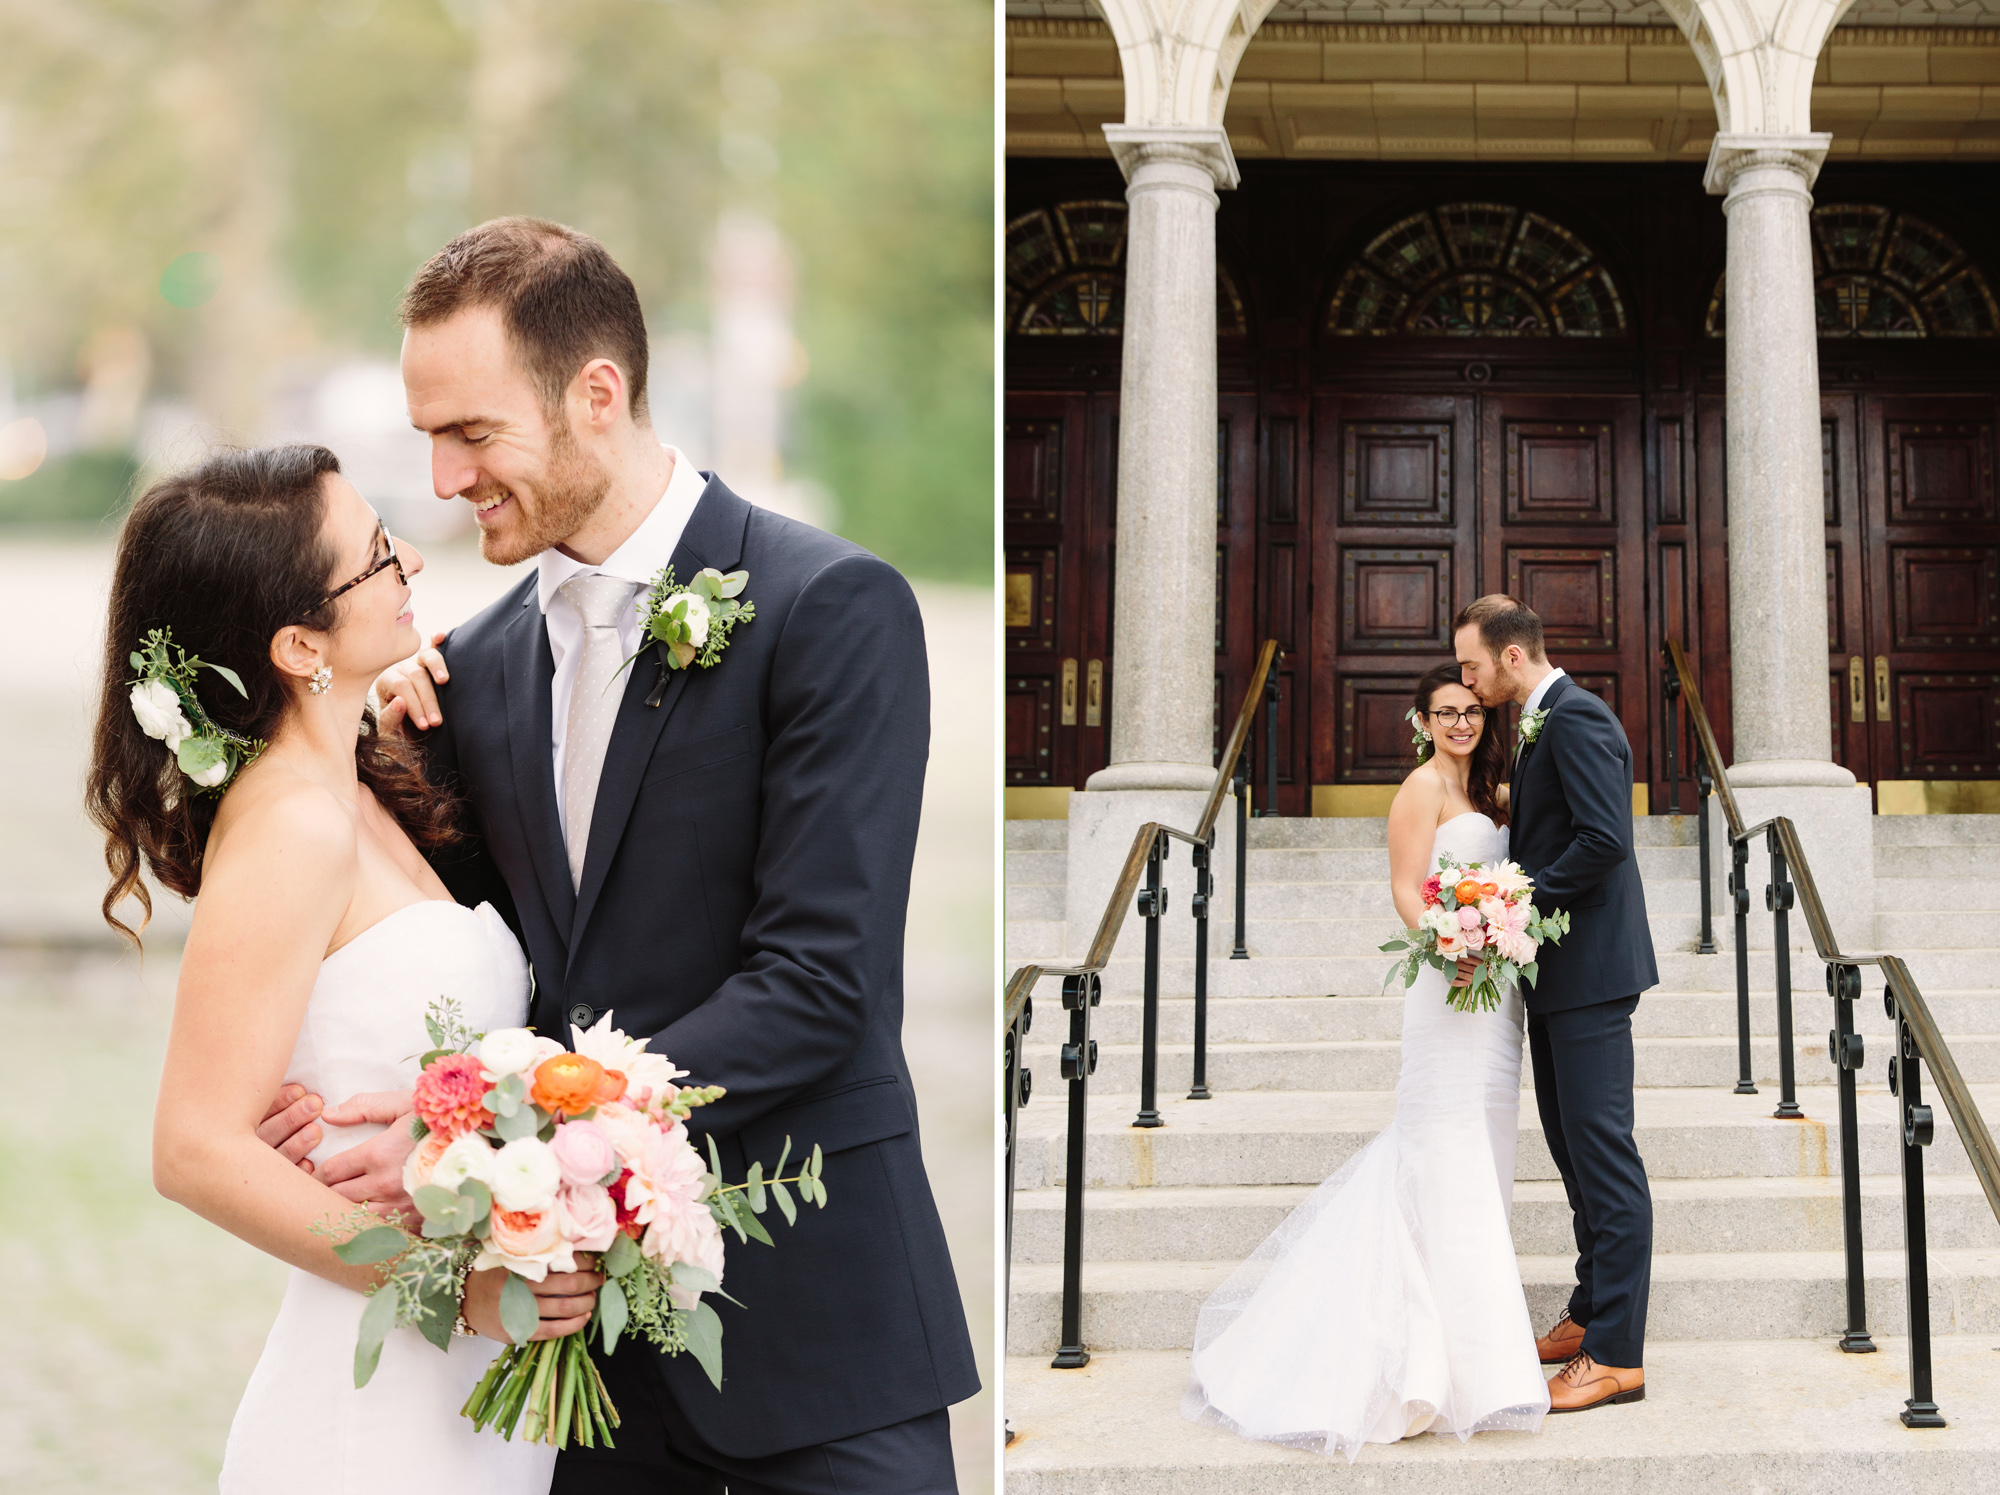 31a_Kate_Sam_Picnic_House_Wedding_Brooklyn_NY_Tanya_Salazar_Photography.jpg